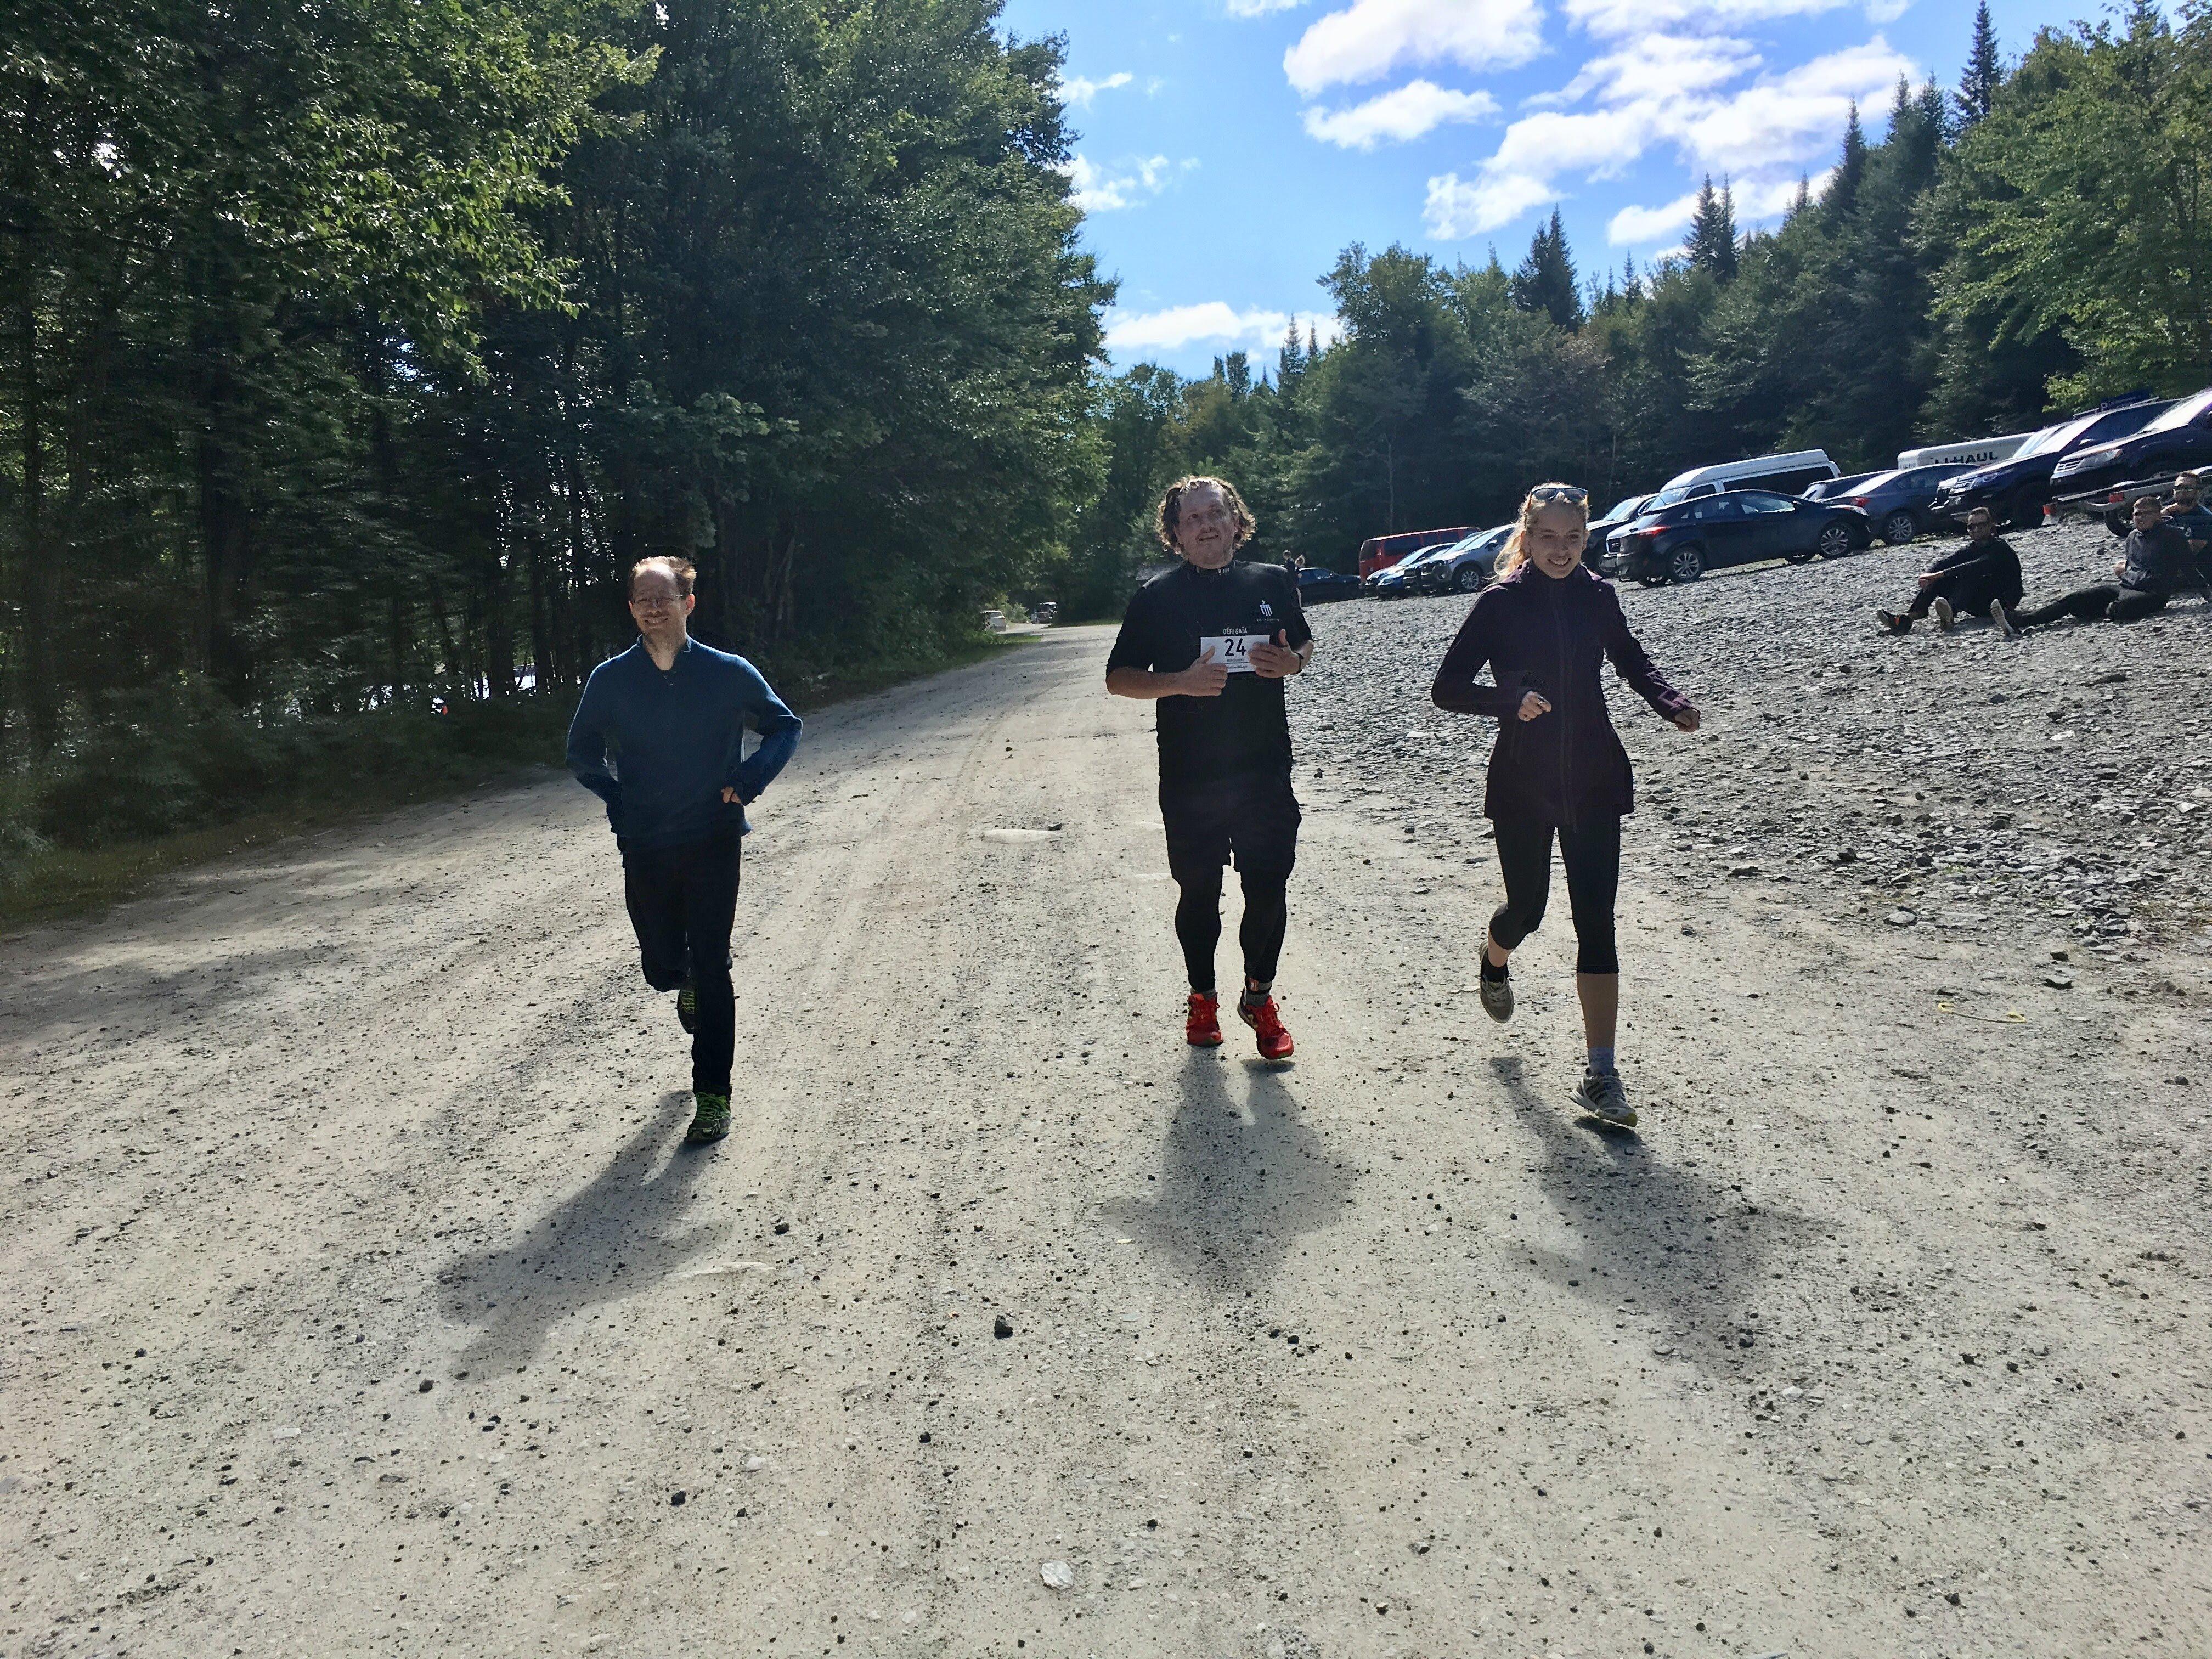 final sprint by robotiq team